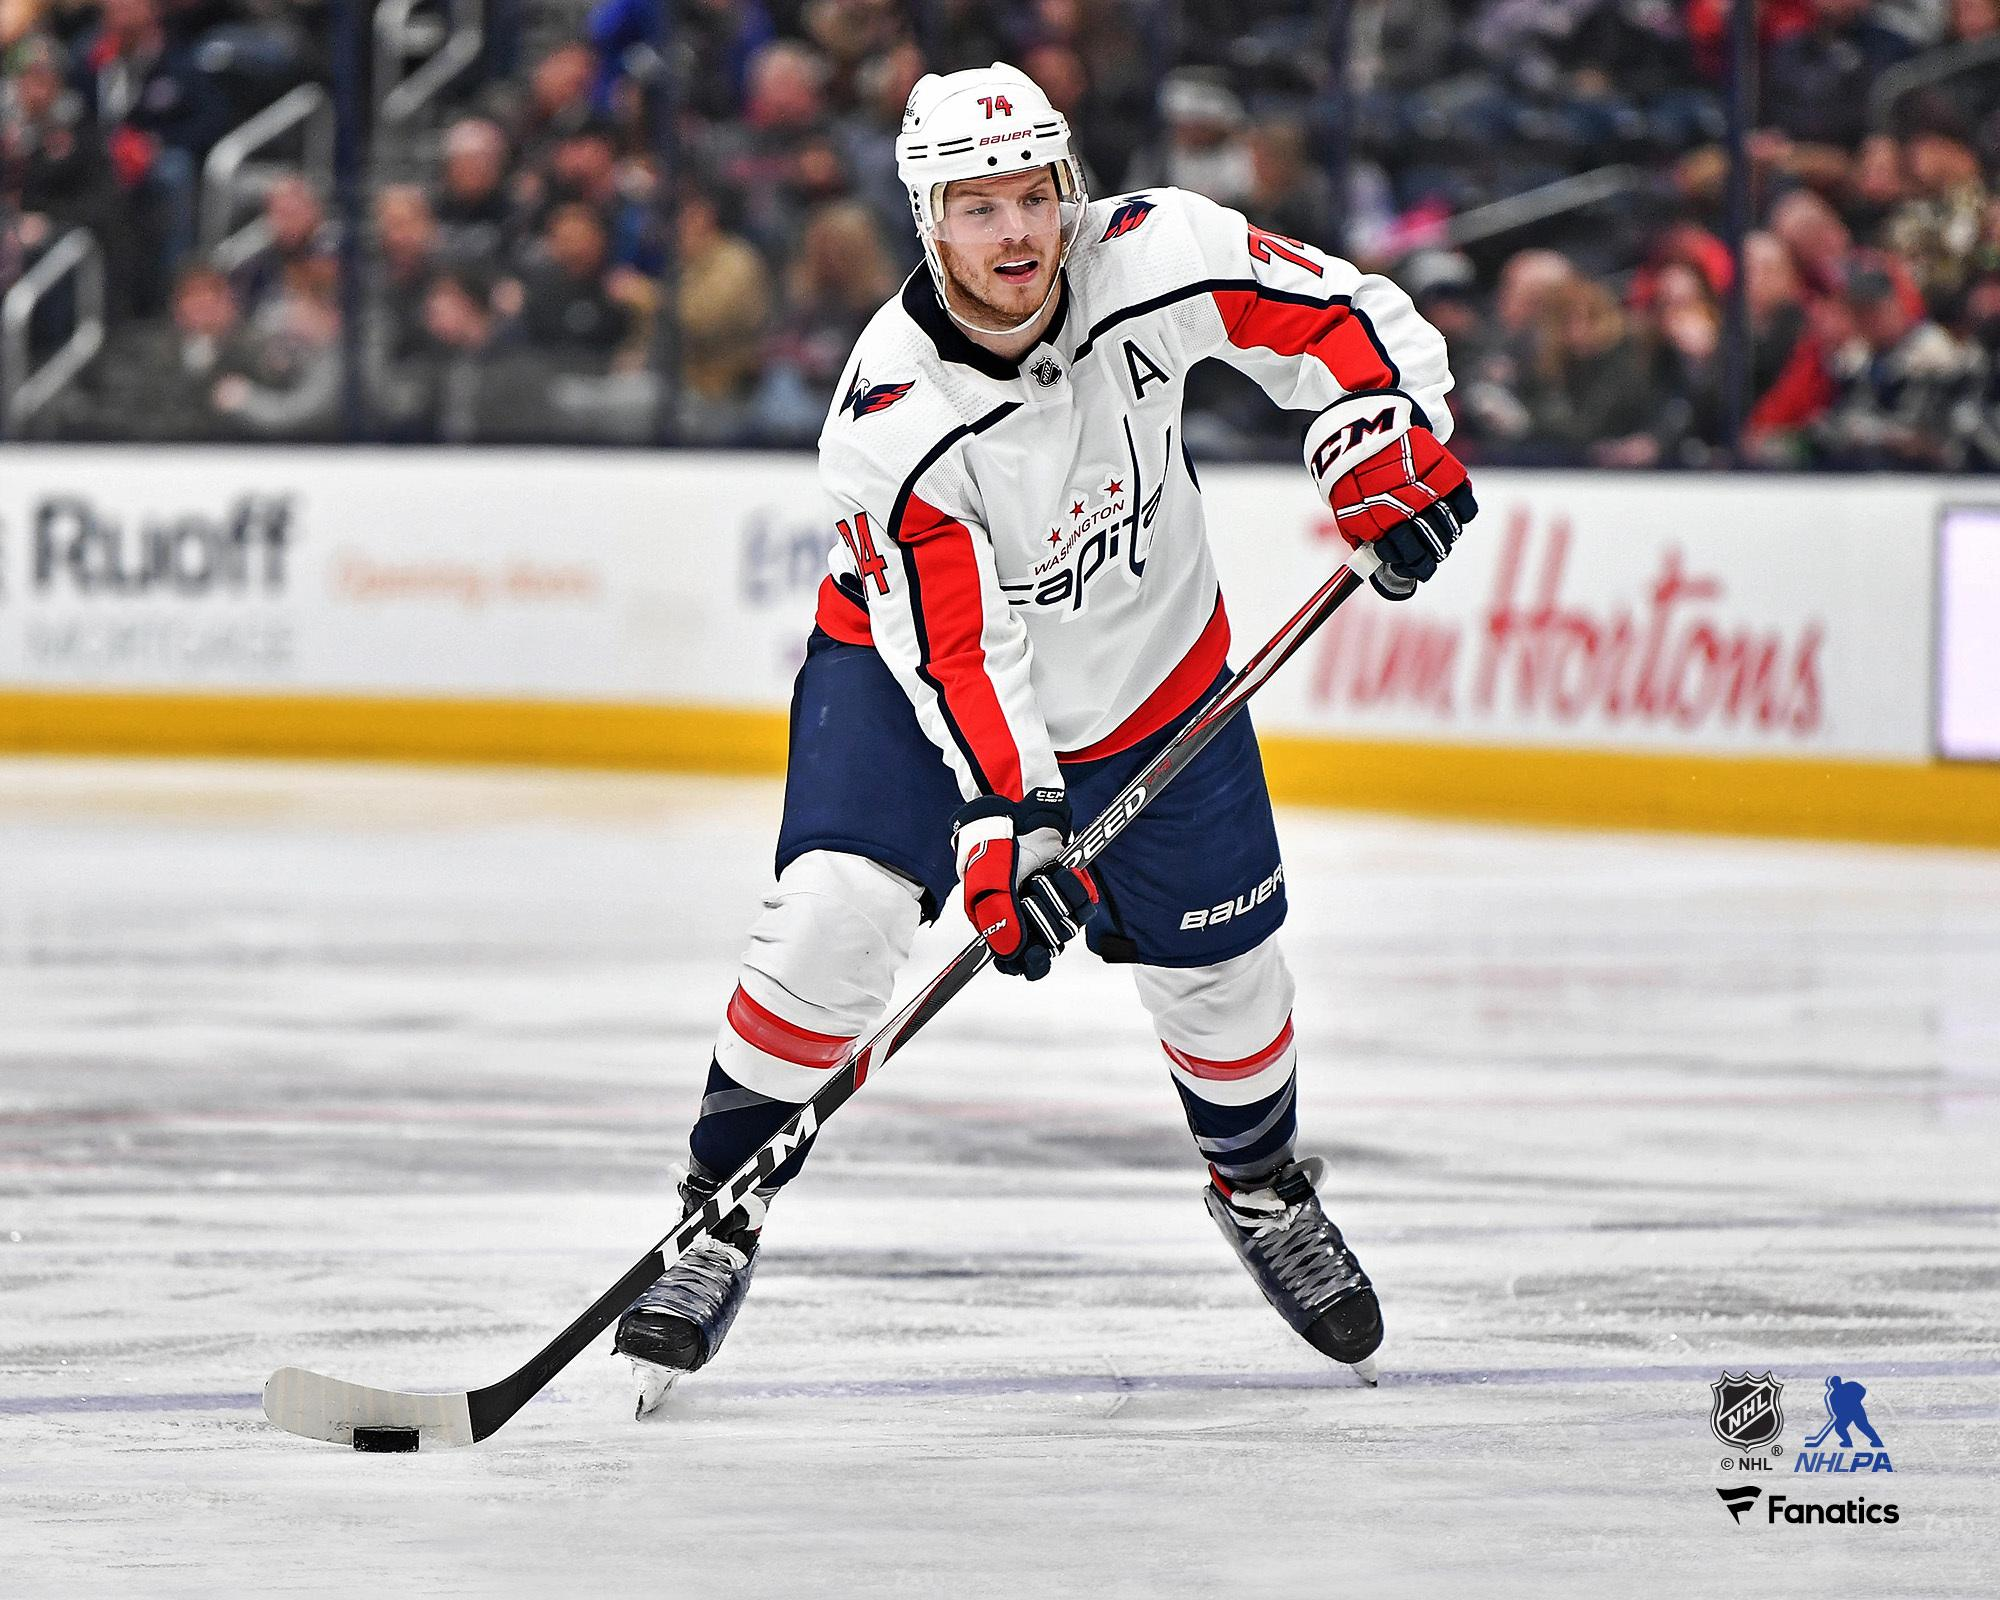 John Carlson Washington Capitals Unsigned White Jersey Skating Photograph - Walmart.com